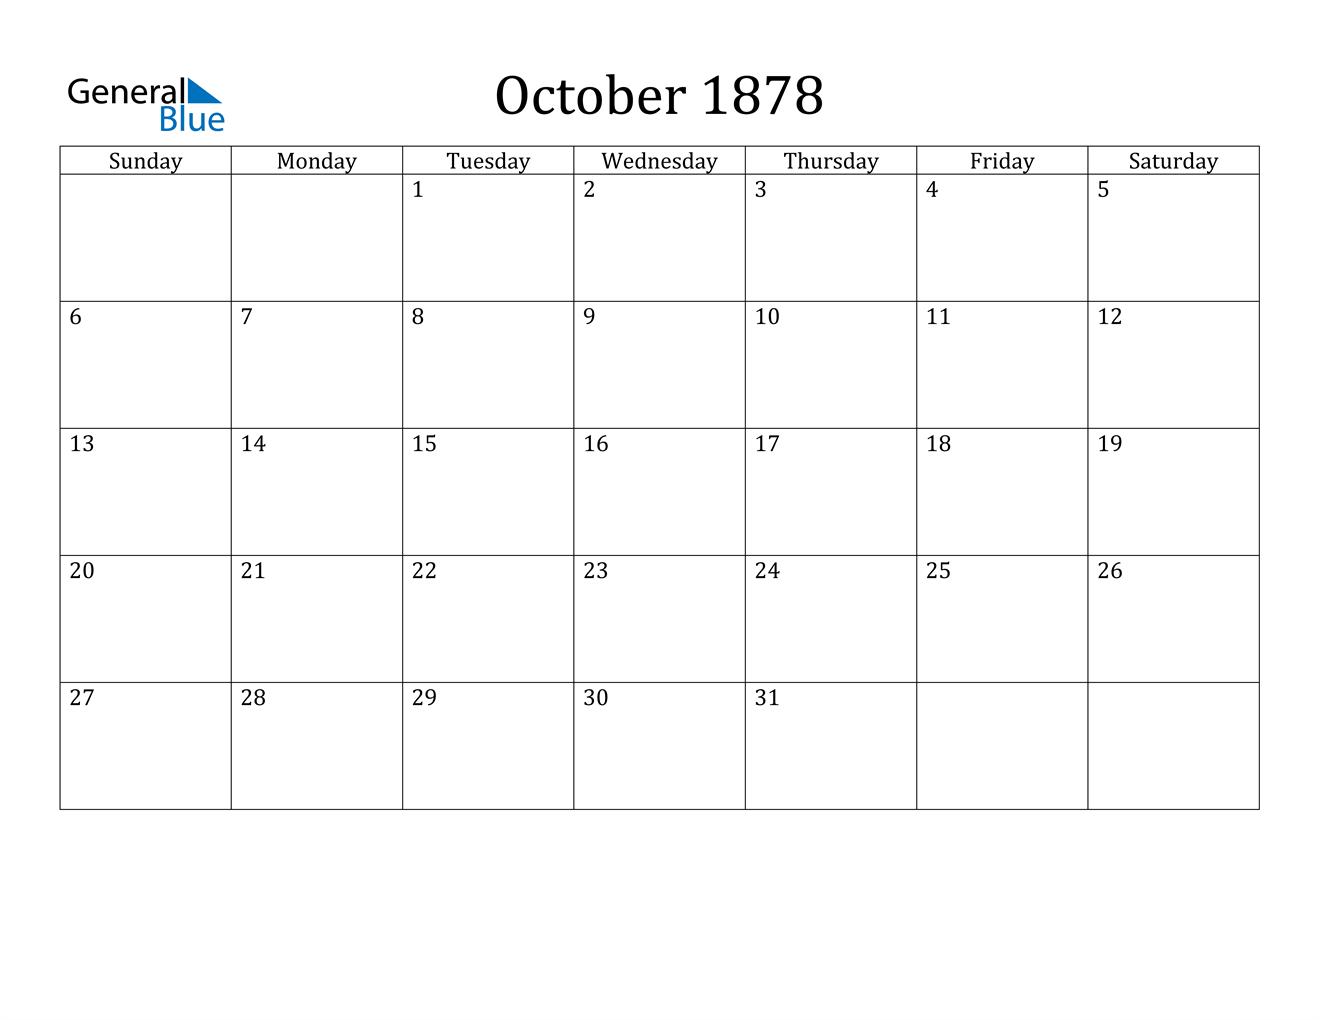 Image of October 1878 Calendar